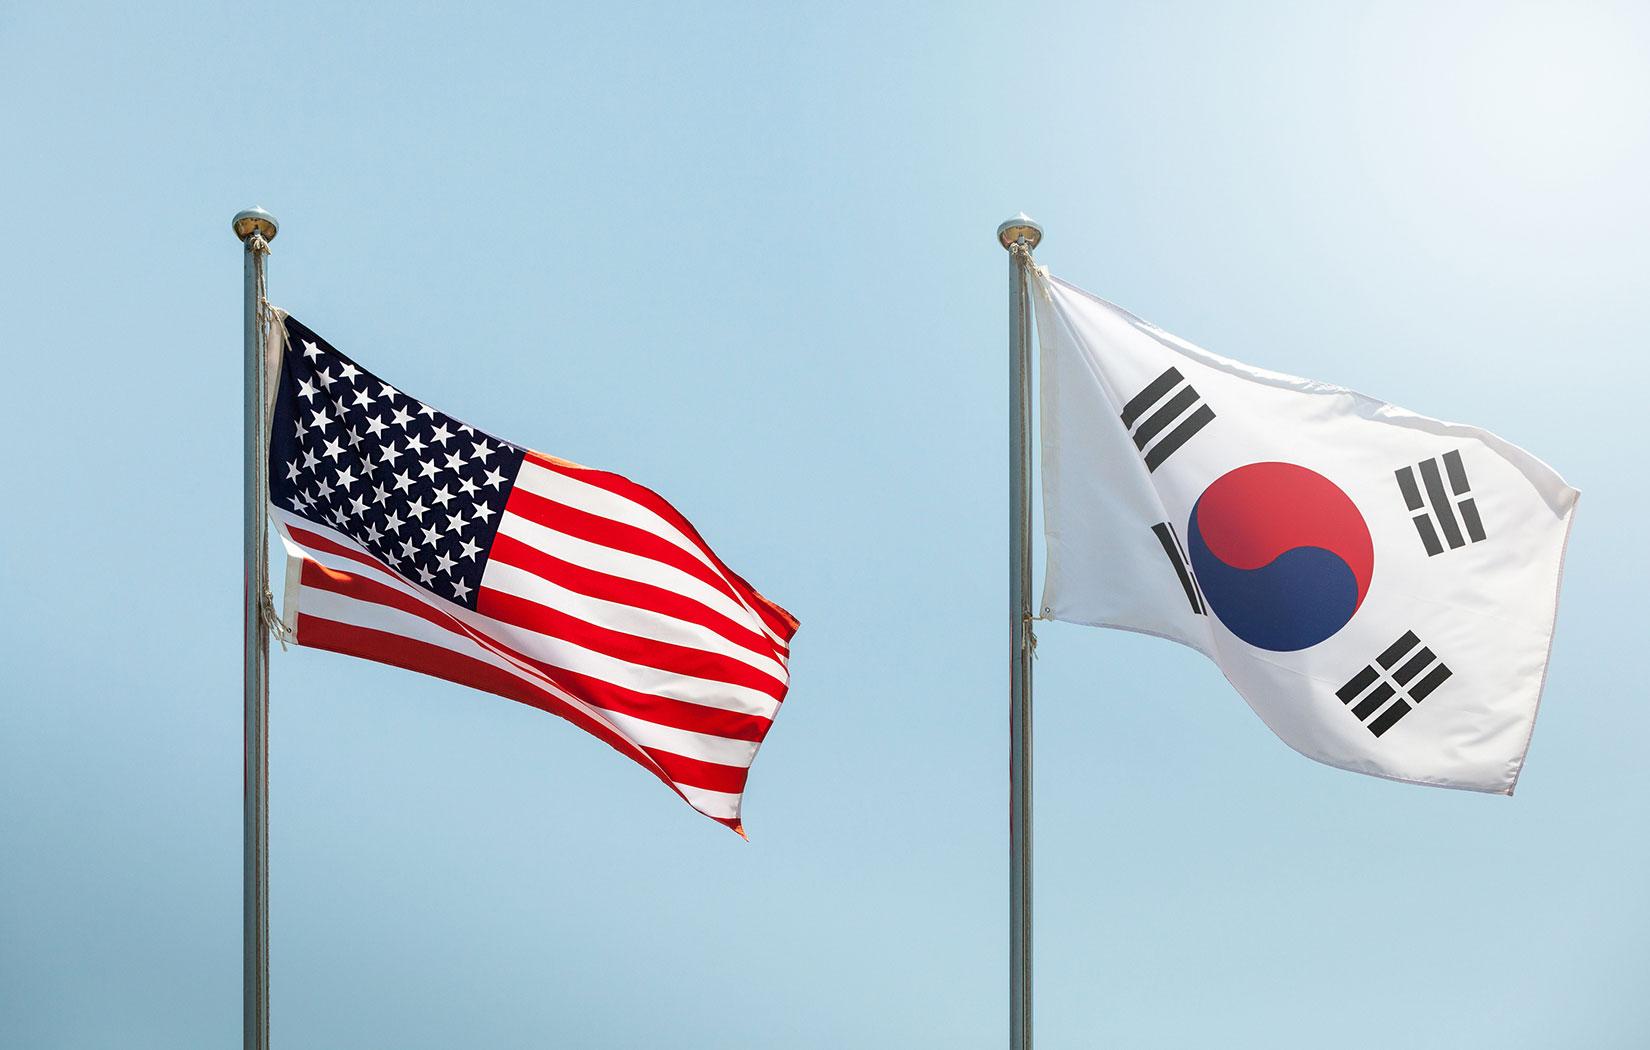 The South Korean government's suspicions regarding the US movements